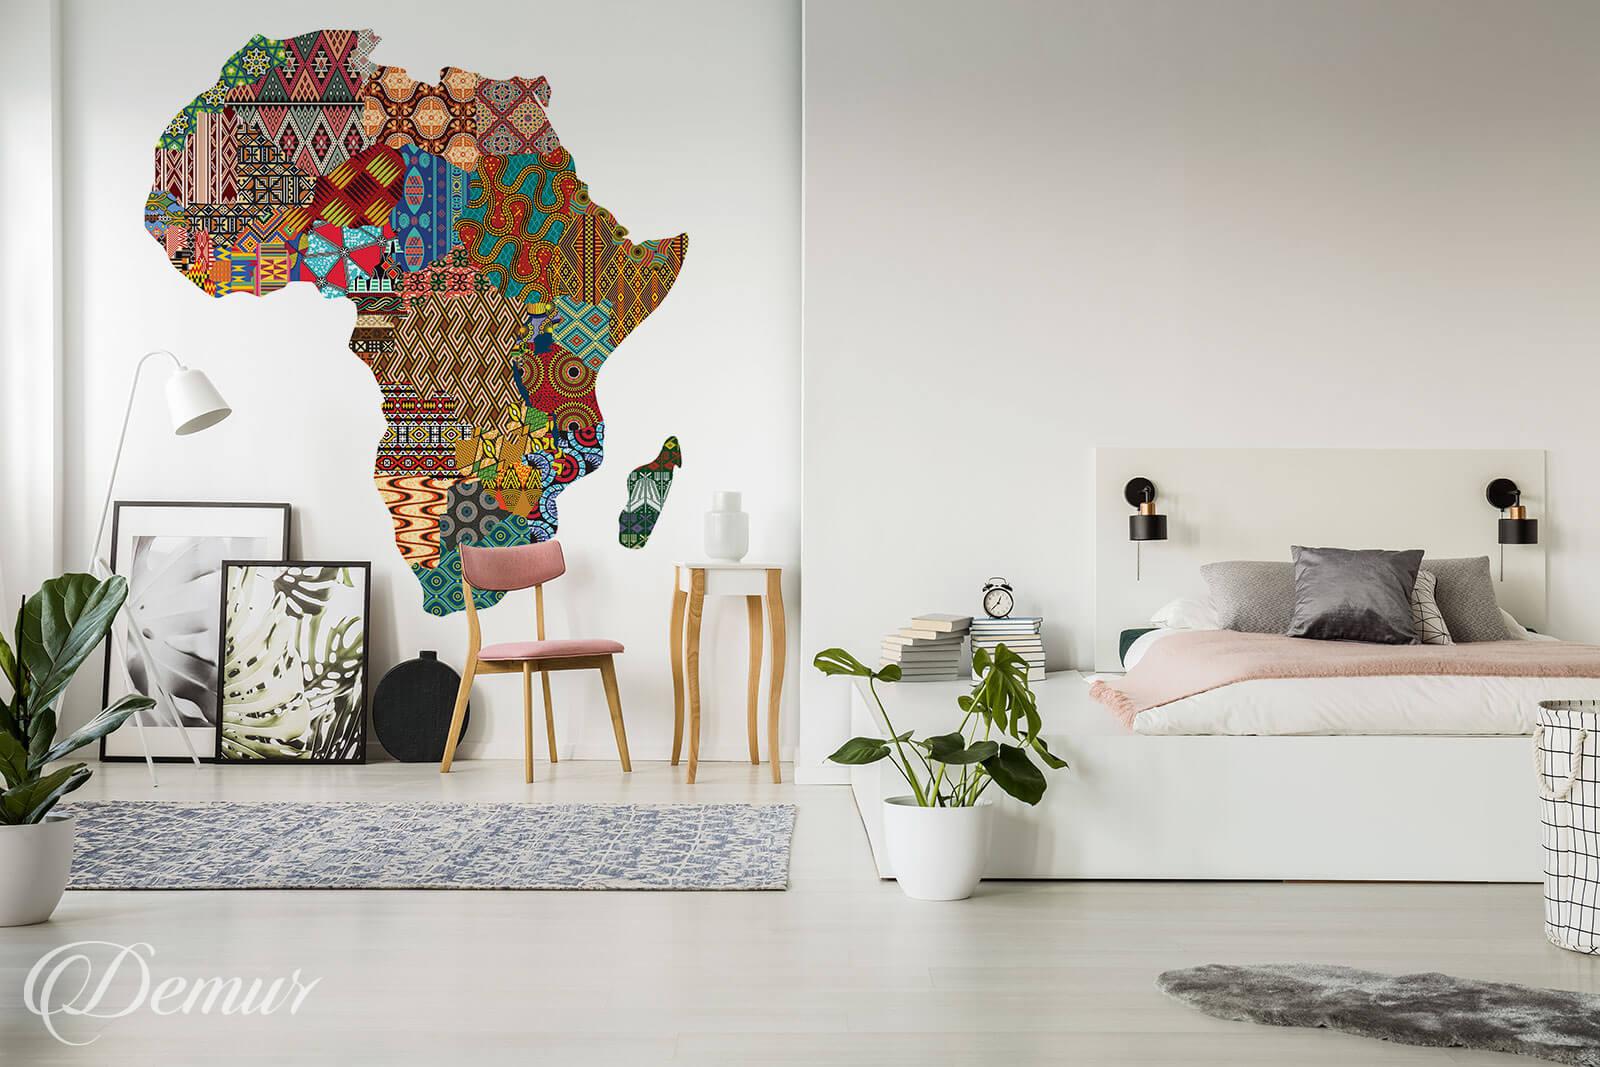 Fototapeta Mapa Afryki - Fototapety Afryka - Demur